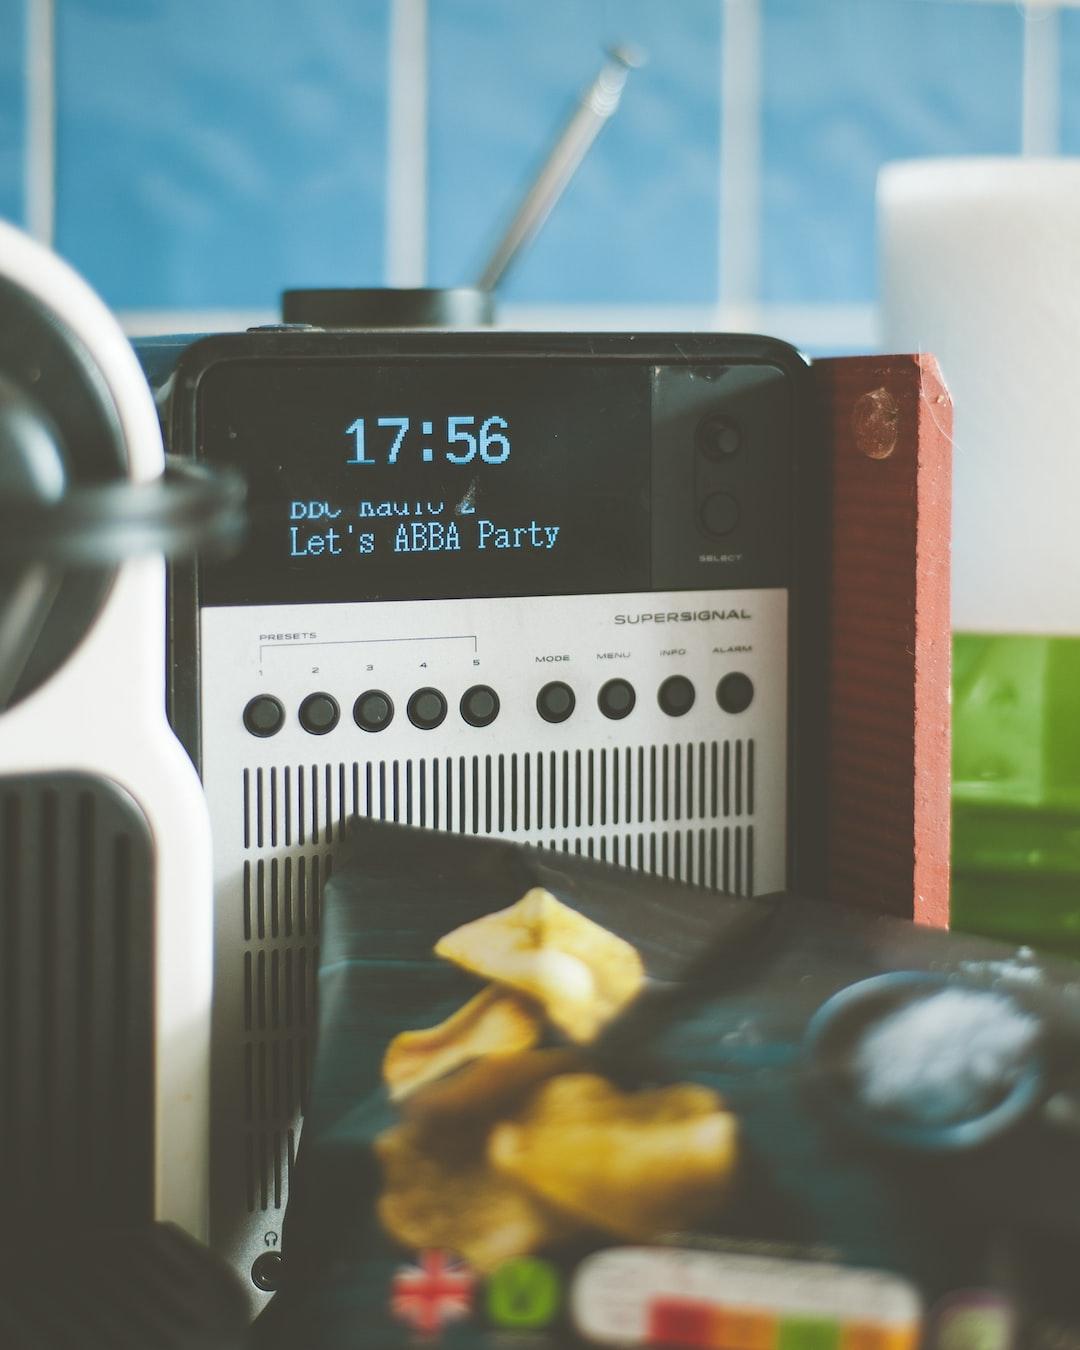 ABBA Party on Radio